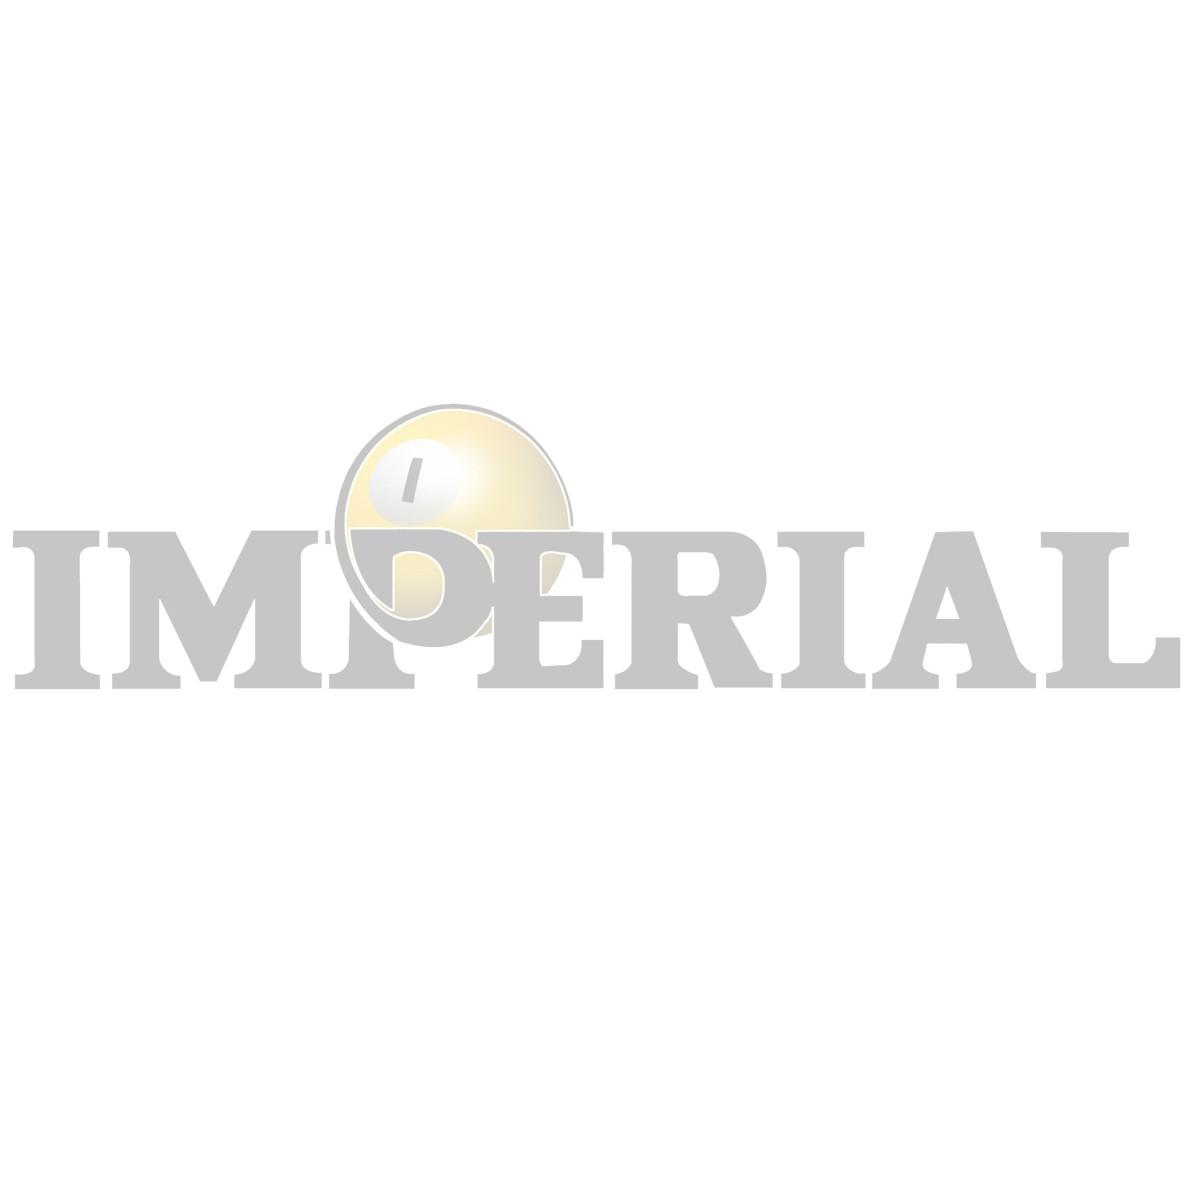 Baltimore Ravens Home vs. Away Billiard Ball Set